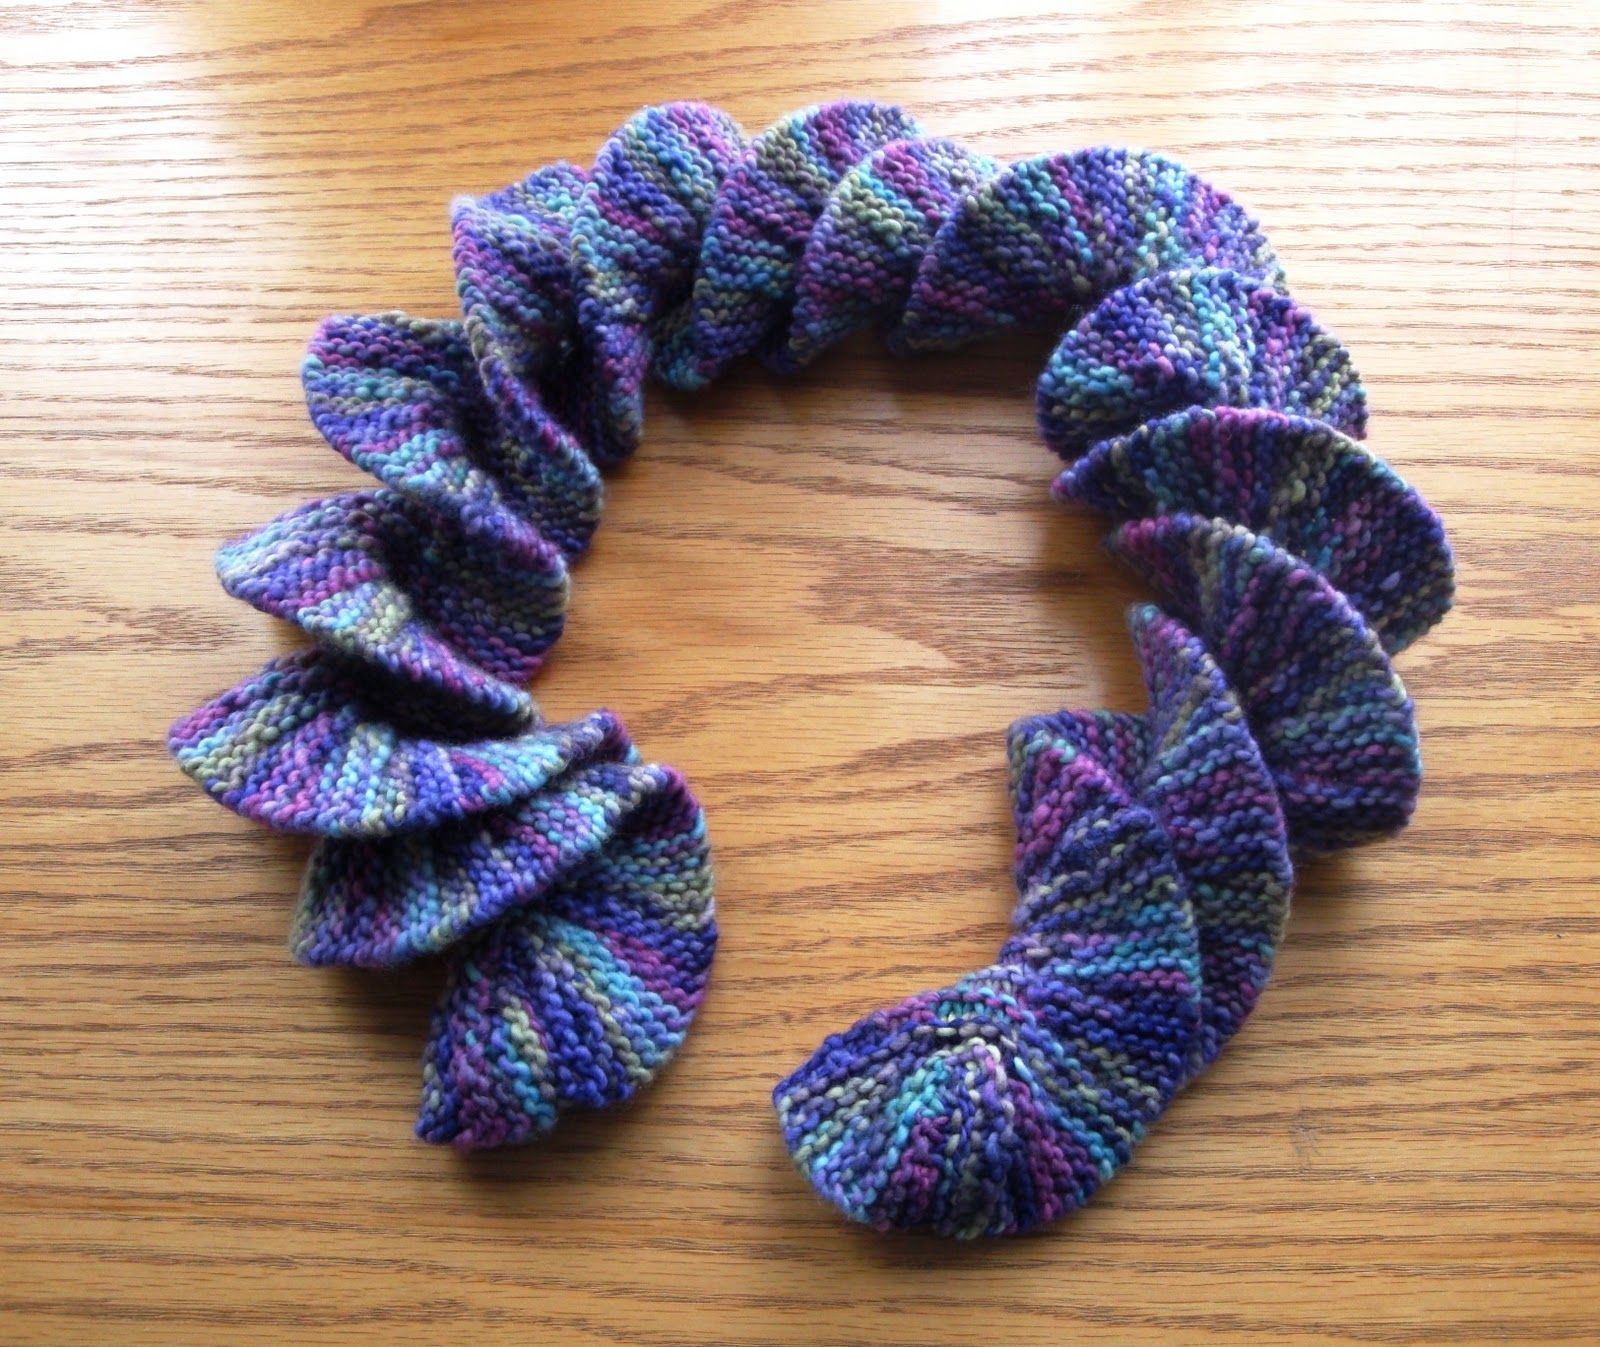 Crochet curly scarf pattern potato chip scarf pattern for the crochet curly scarf pattern potato chip scarf pattern bankloansurffo Images